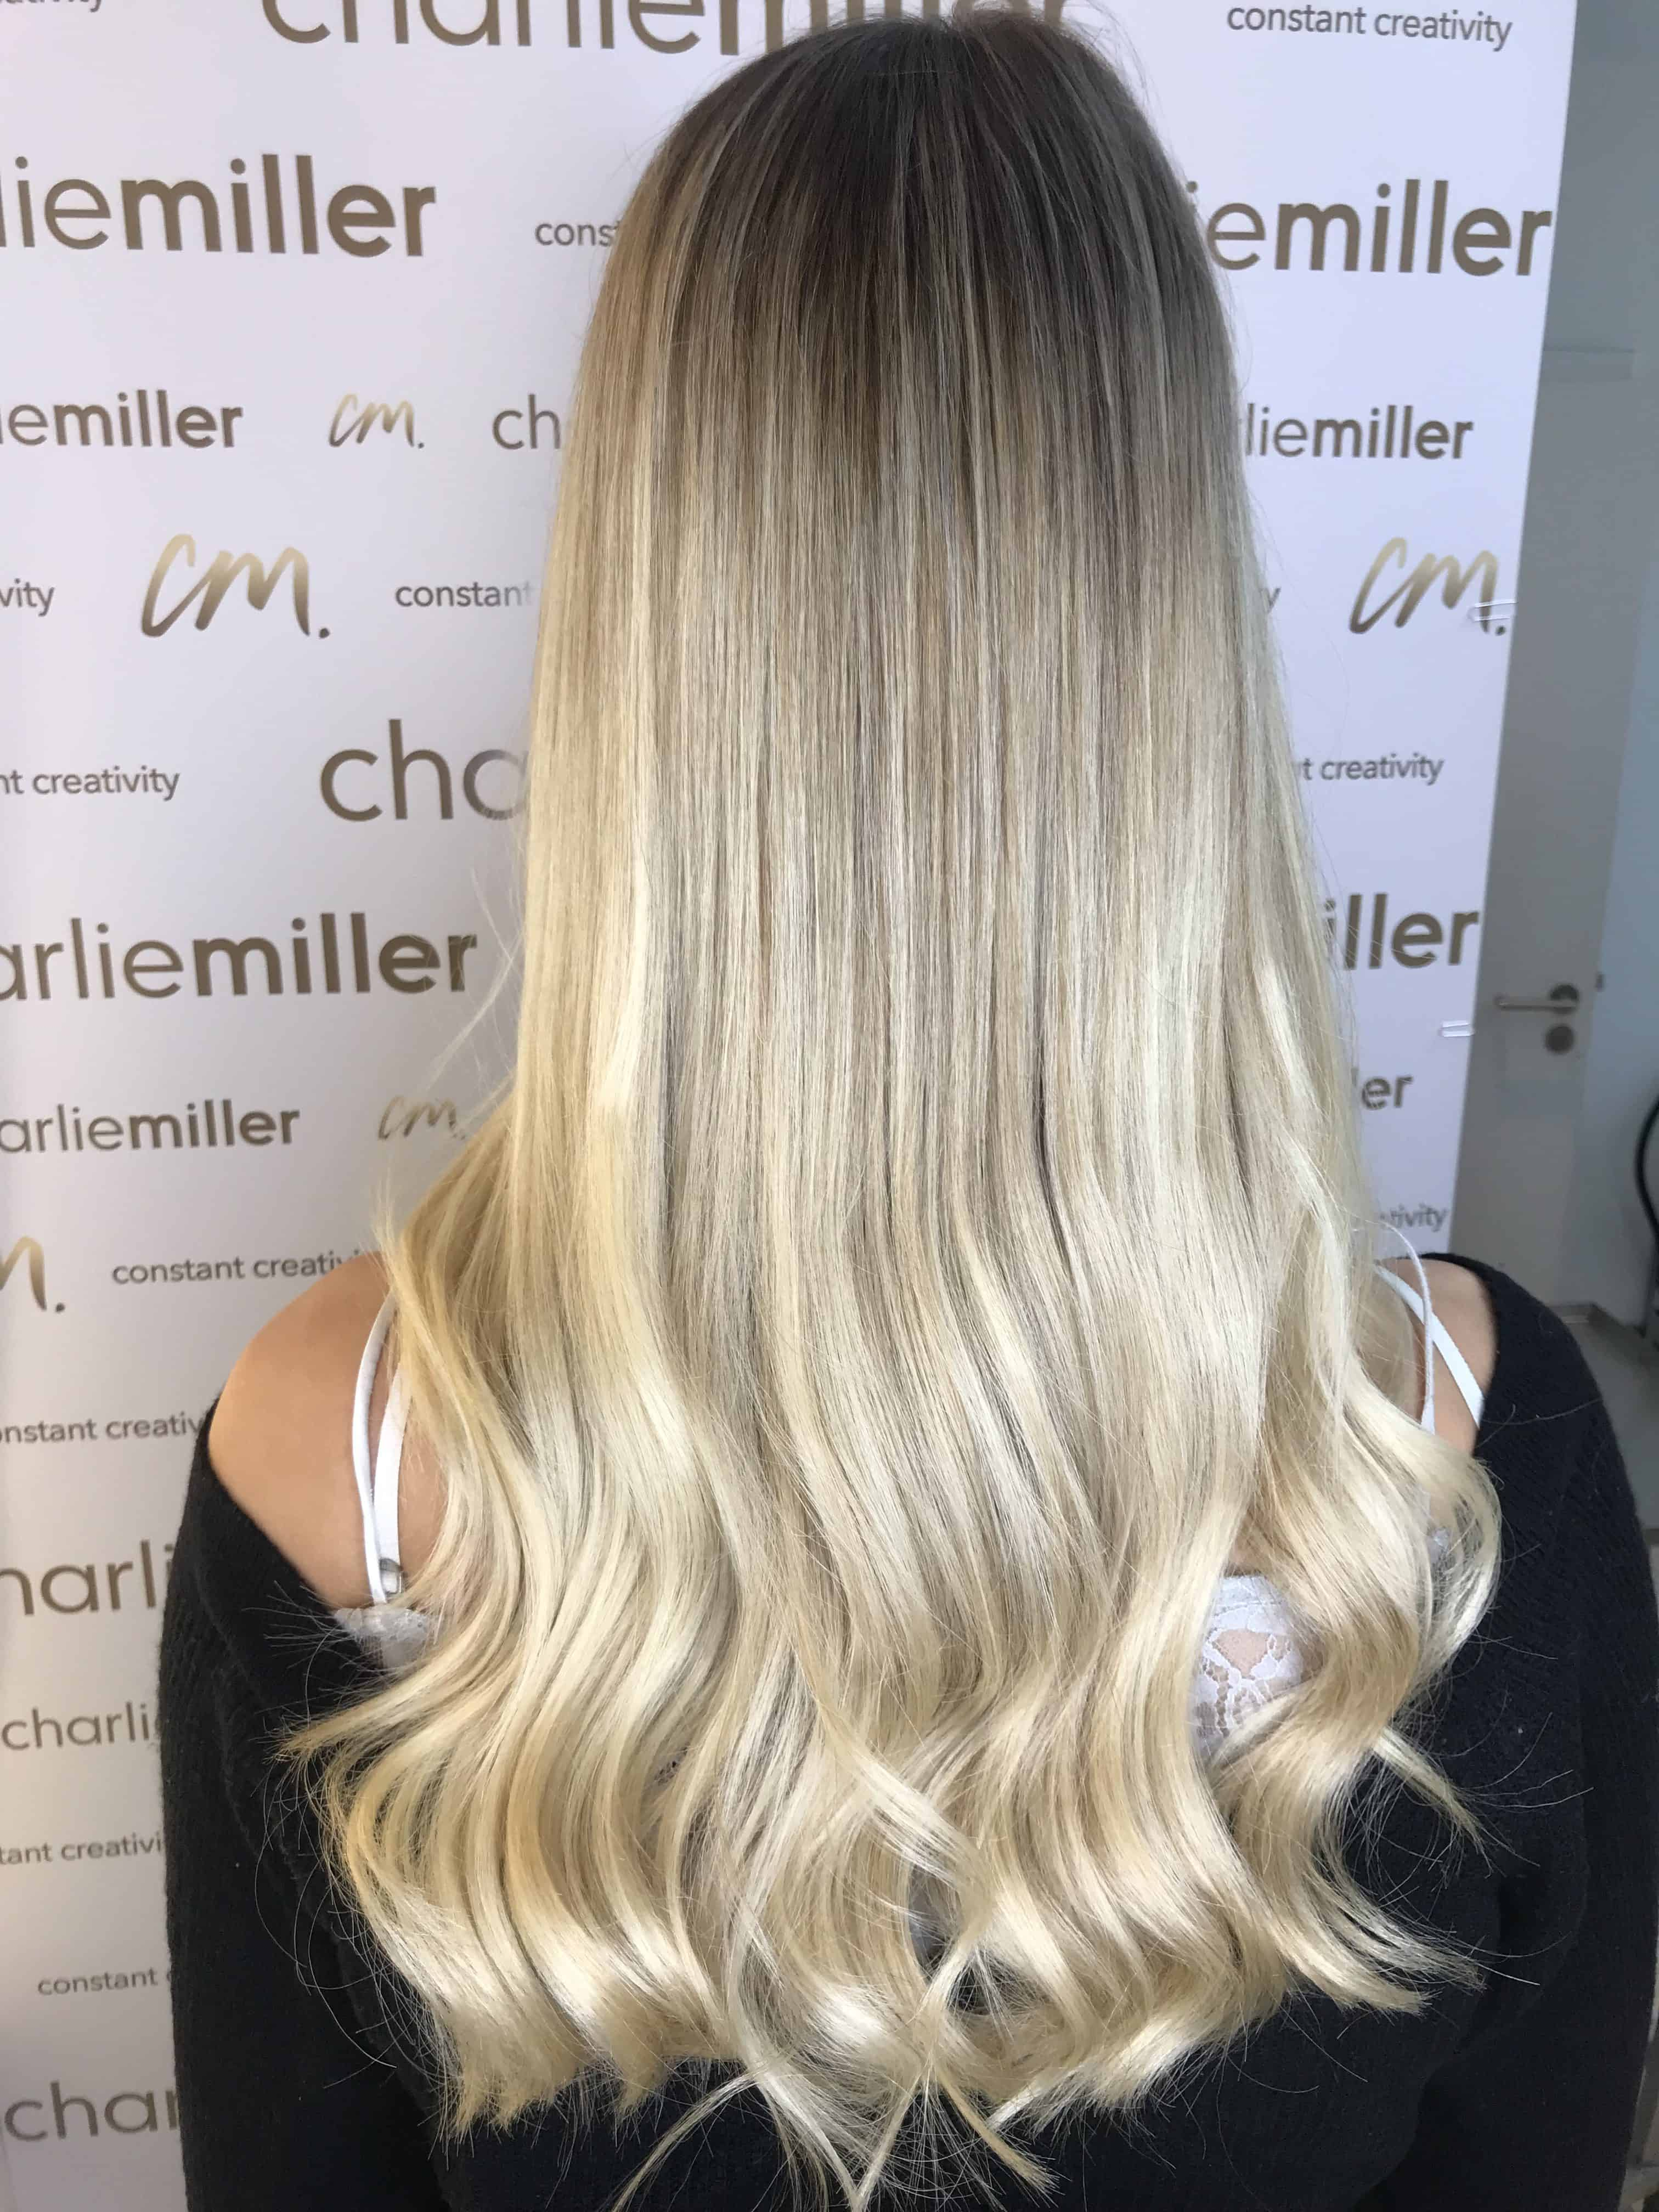 Going Blonde Edinburgh Hairdressers